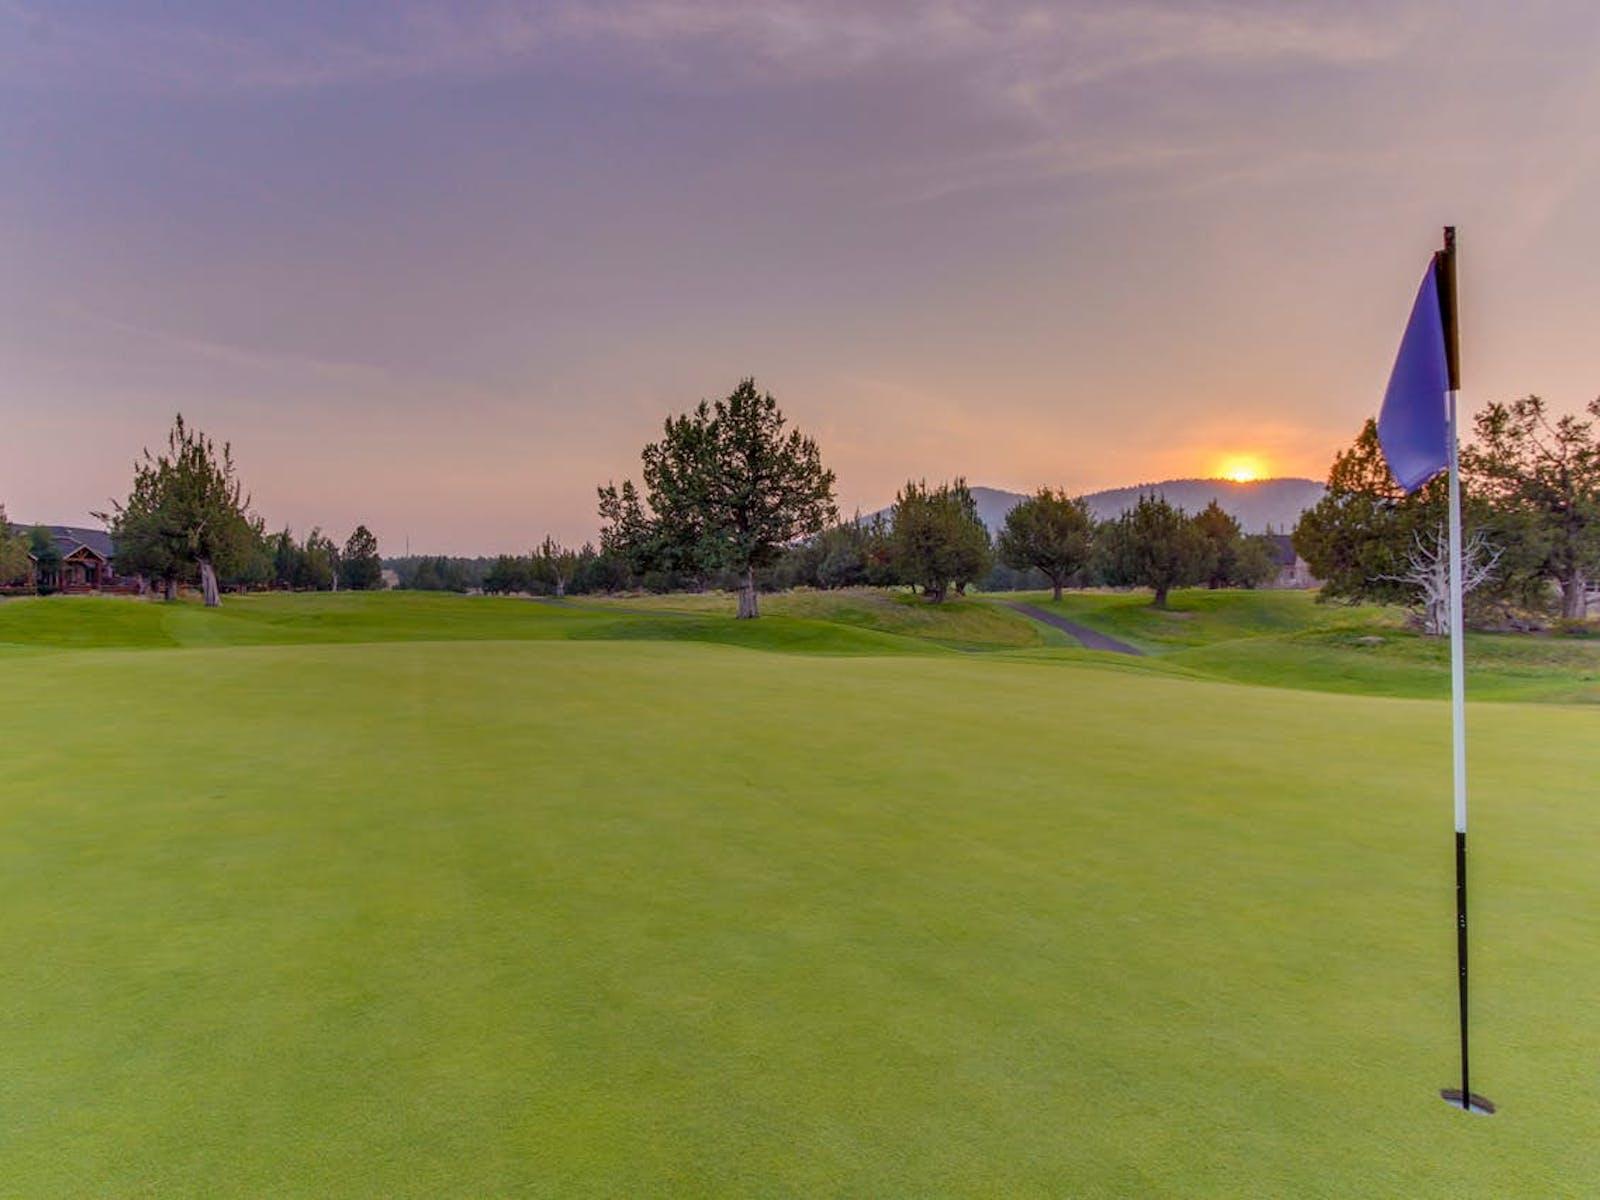 Sun setting over golf course